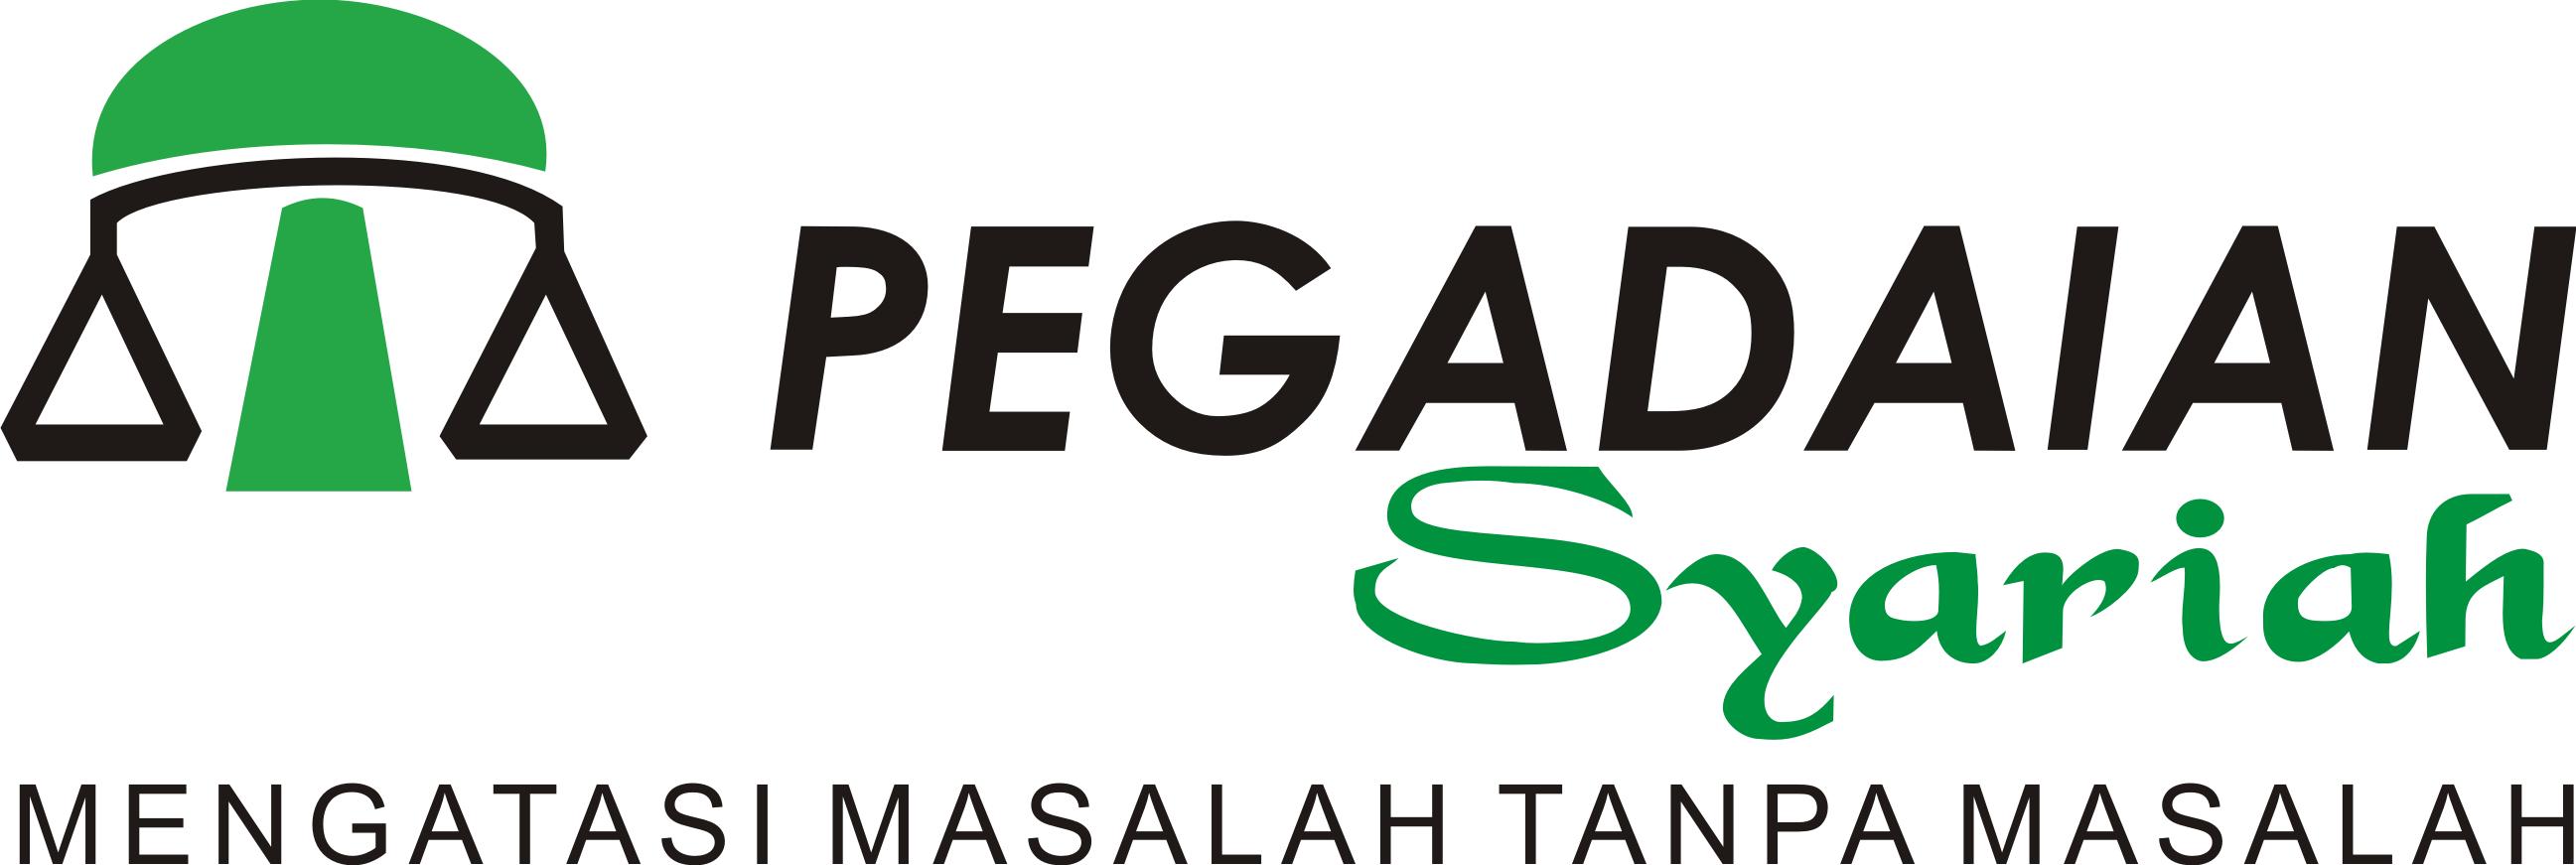 Bisnis forex halal kah